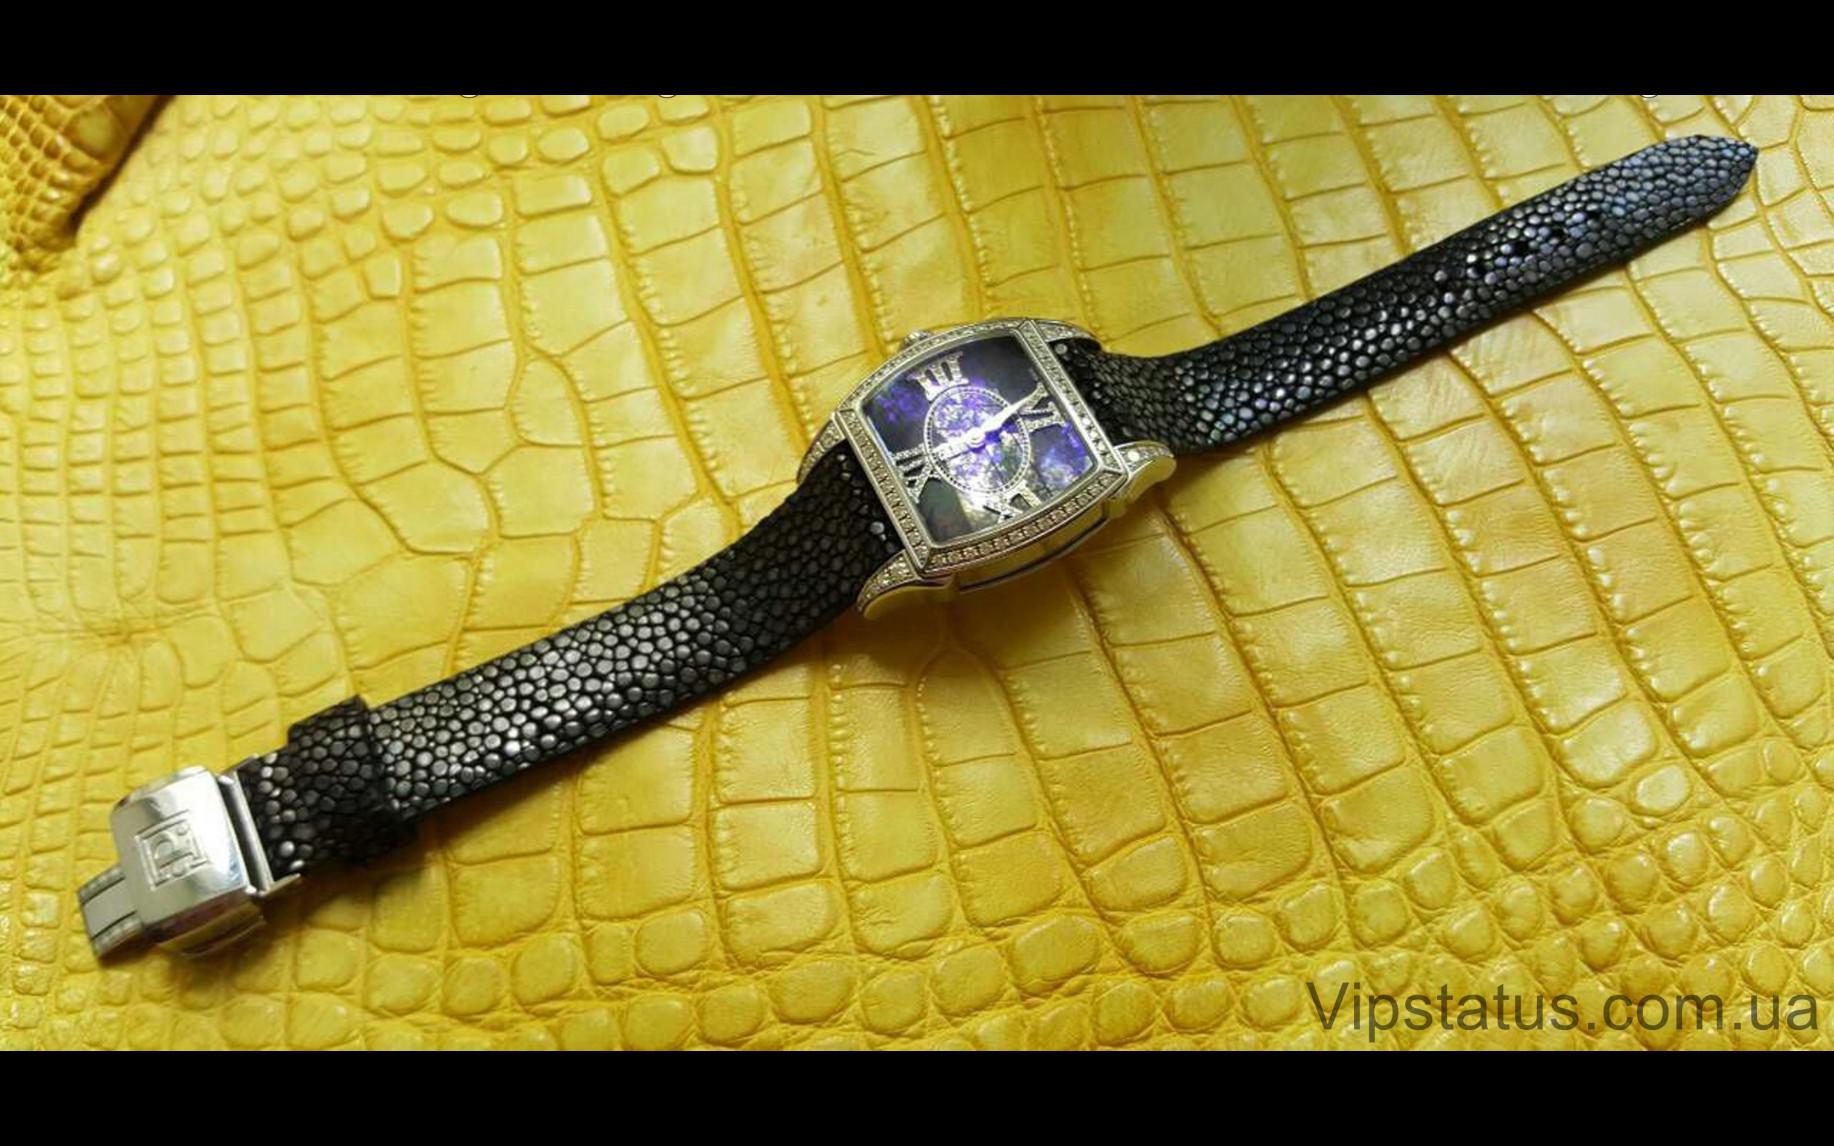 Elite Люксовый ремешок для часов Black Glitter кожа ската Black Glitter Luxury Stingray Leather Strap image 2